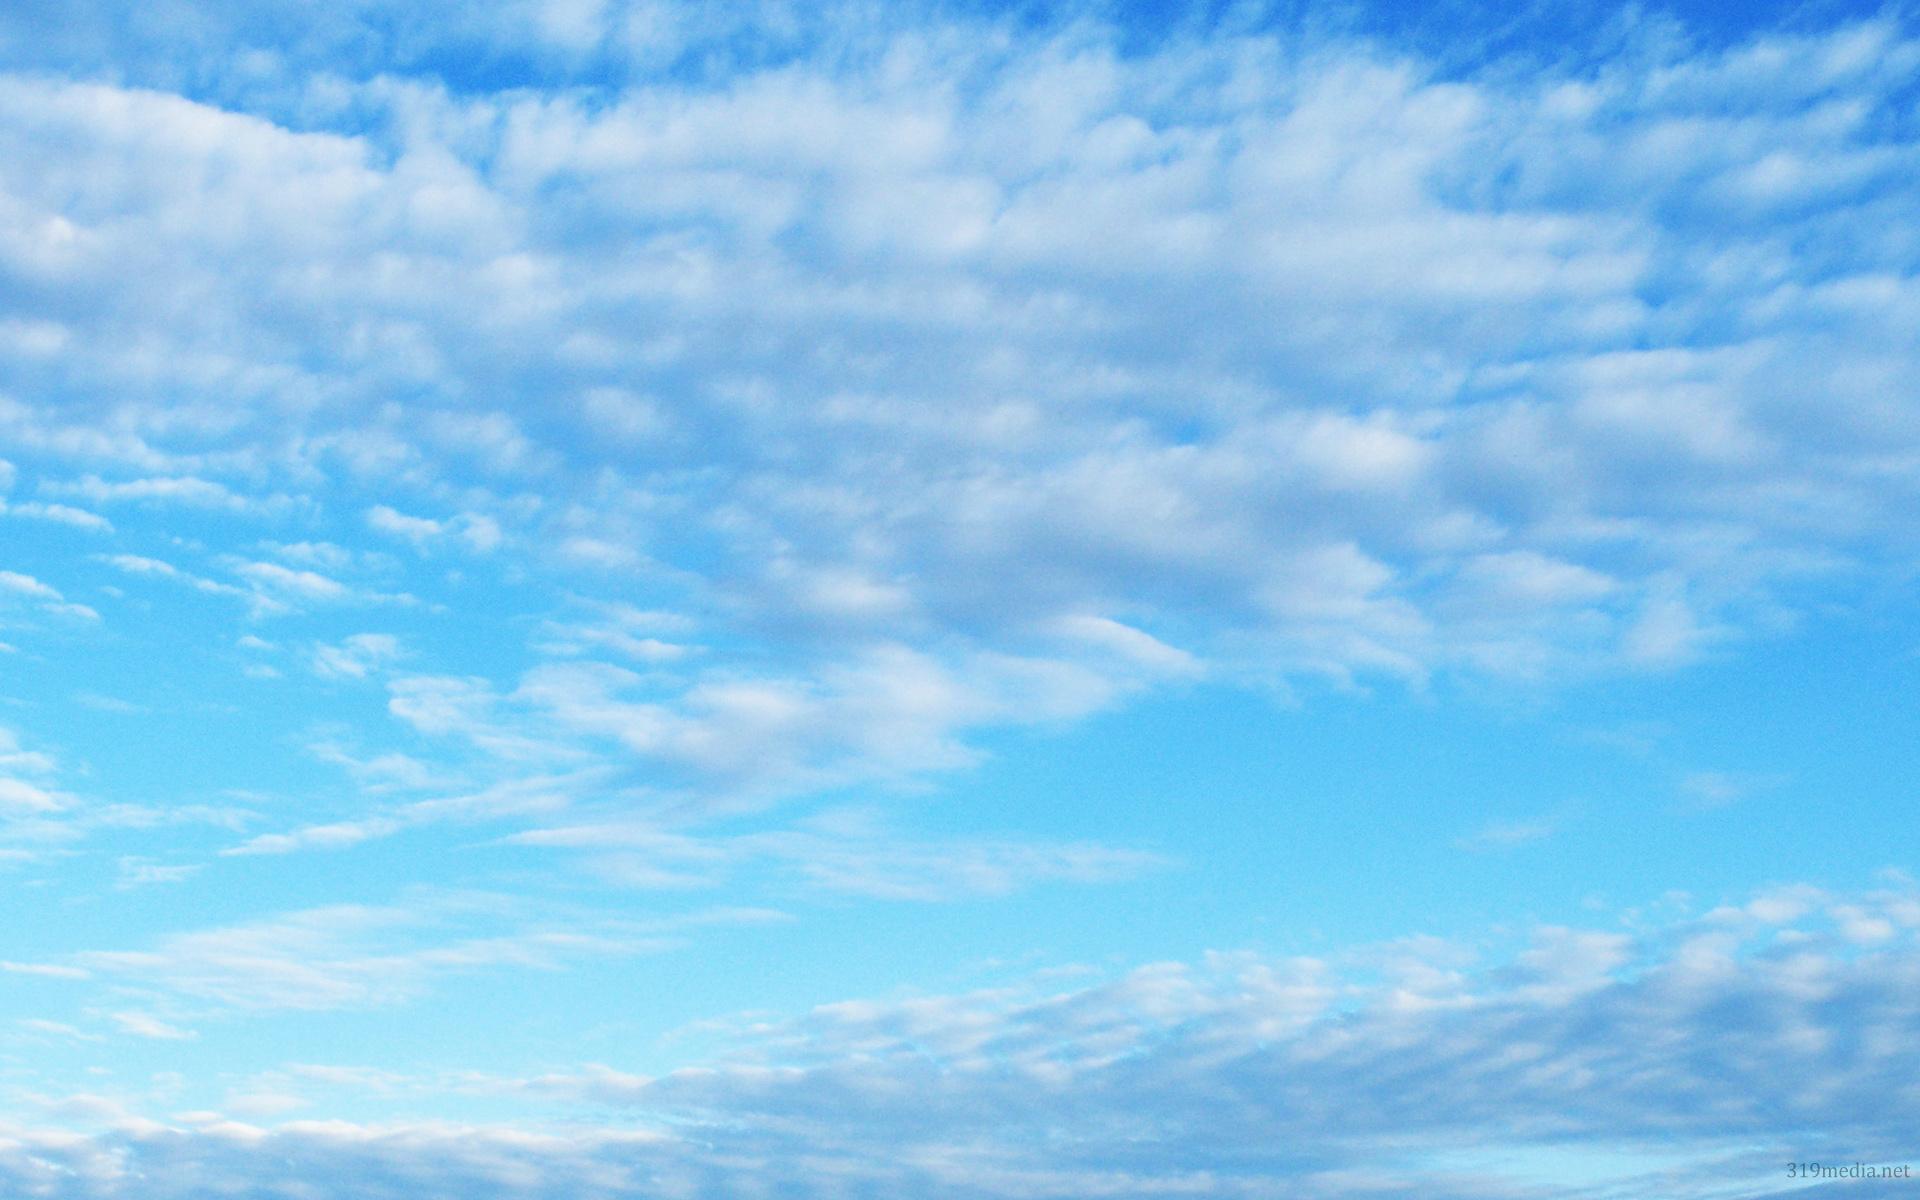 clouds wallpaper hd iphone